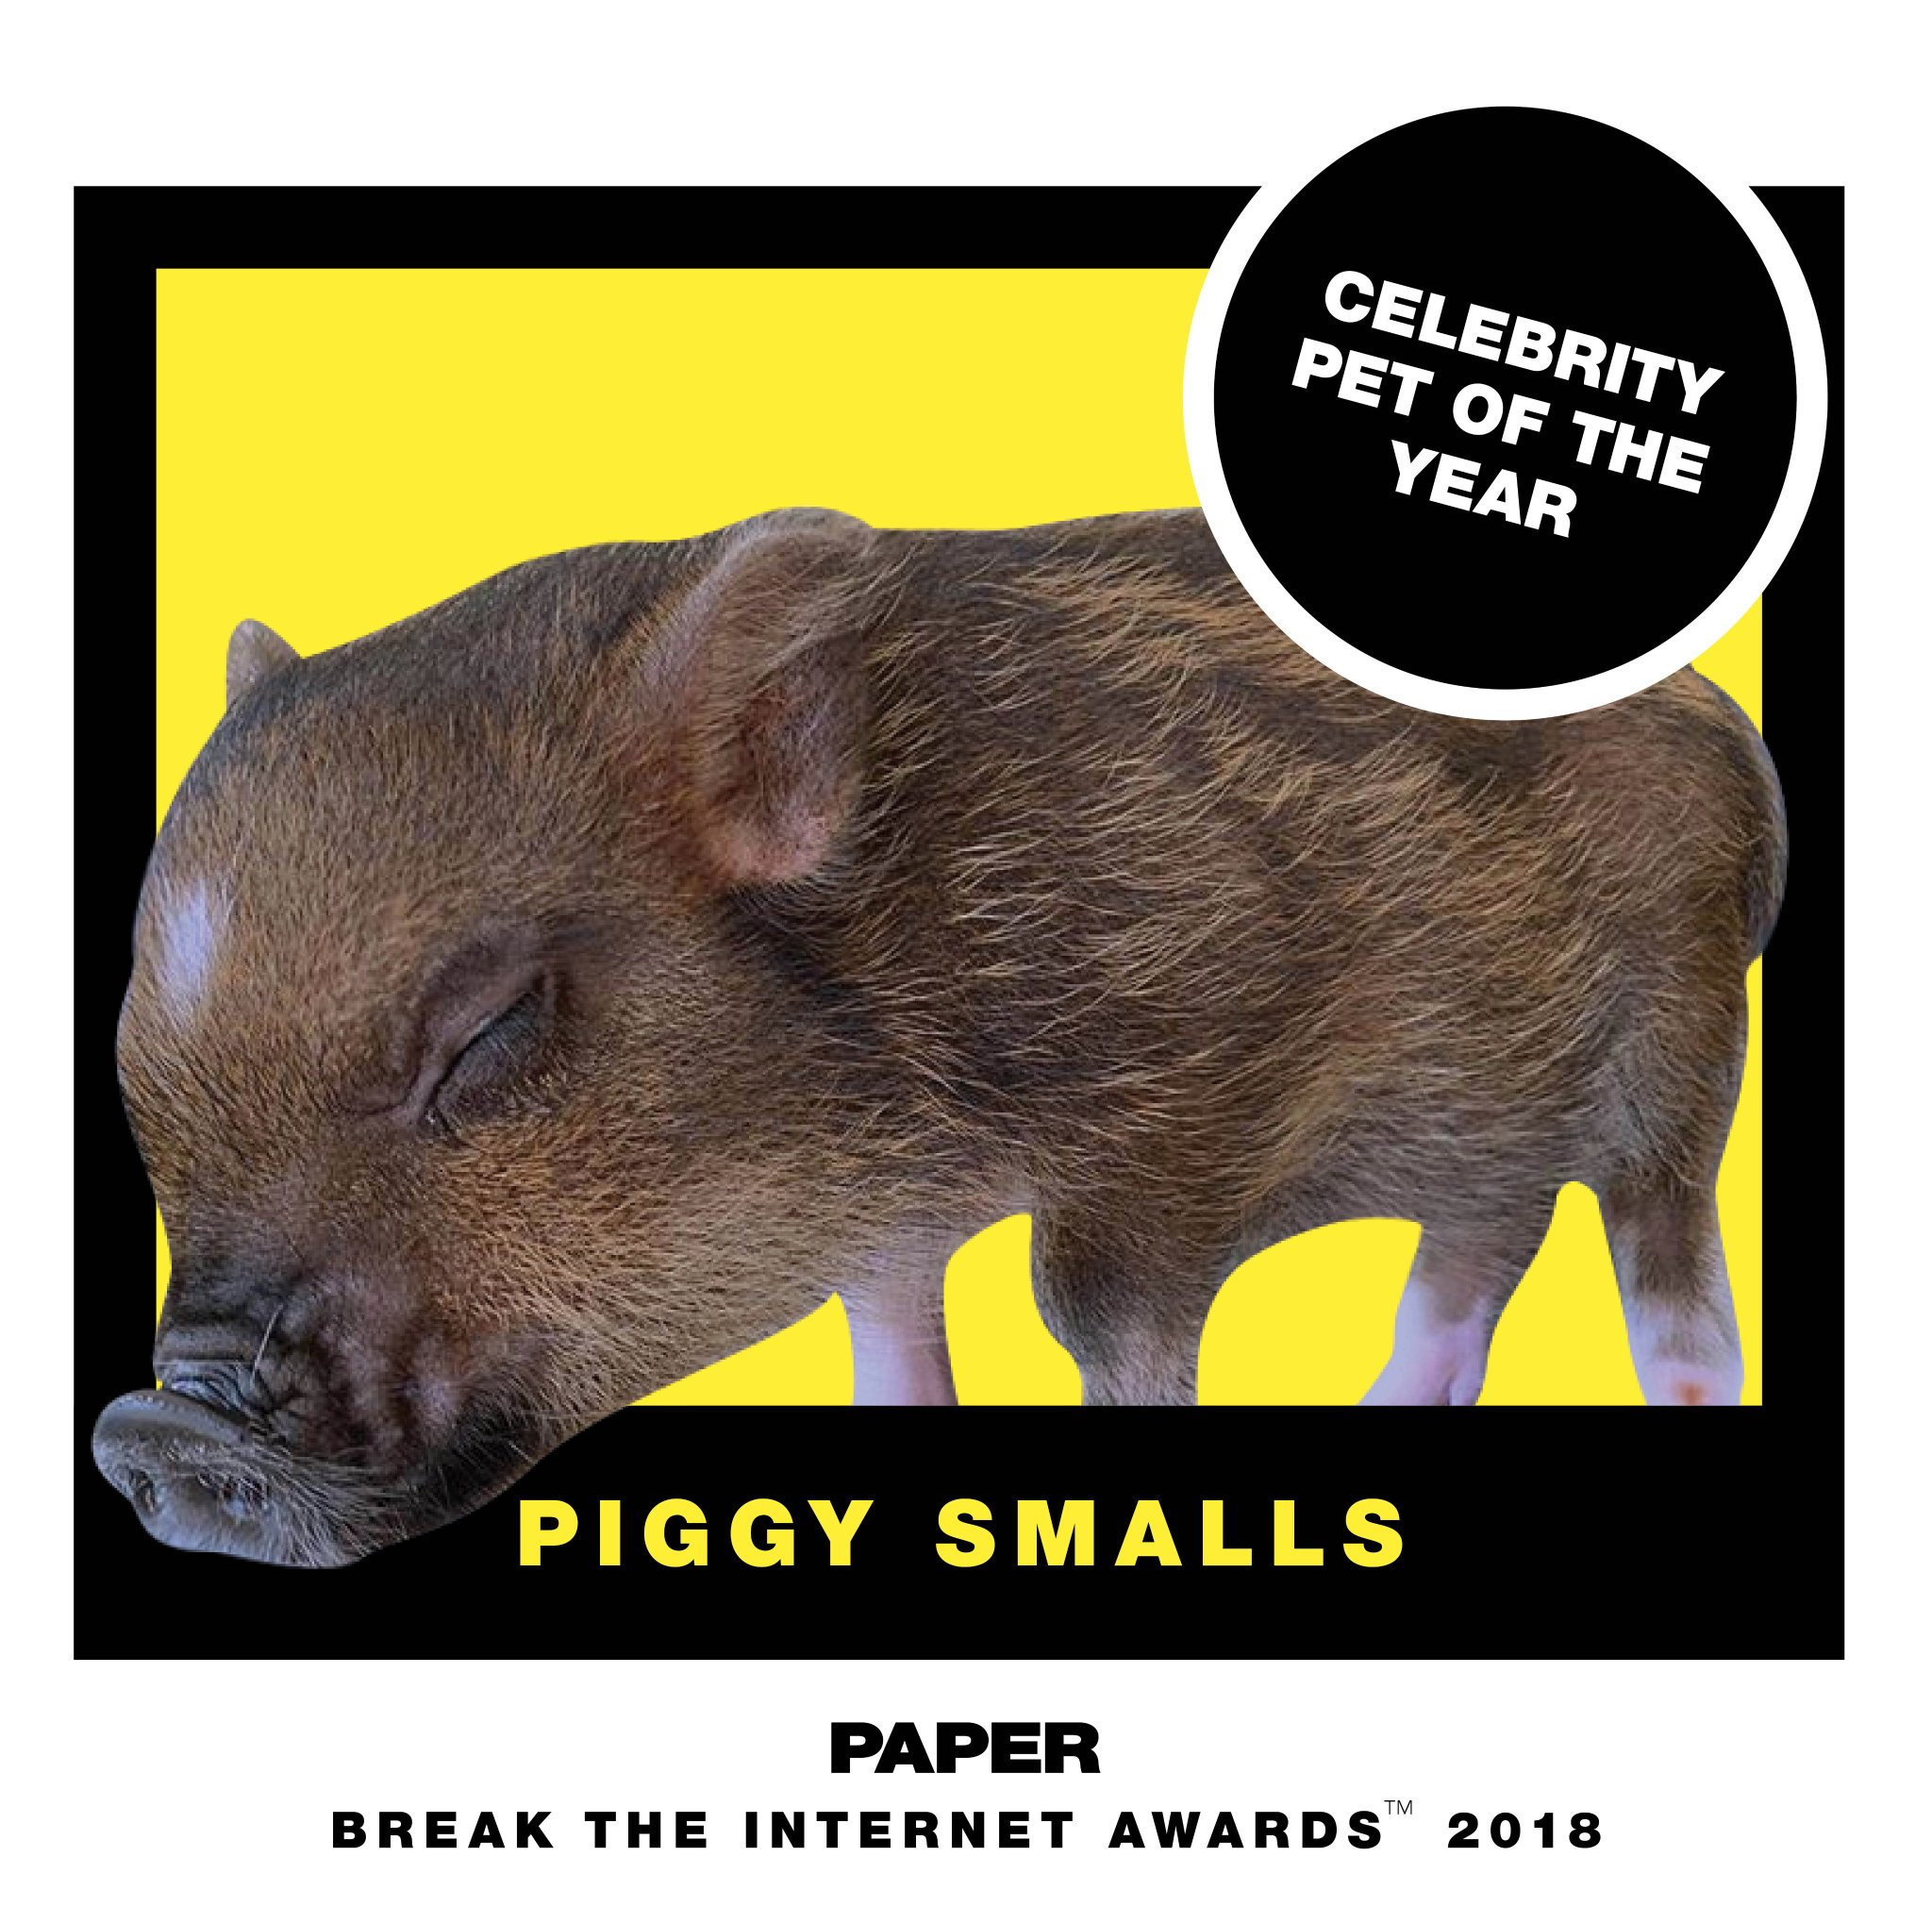 .@ArianaGrande's very own #piggysmalls for celebrity pet of the year! #breaktheinternet  https://t.co/Fnkqv7FGh6 https://t.co/54dd9S0zLp